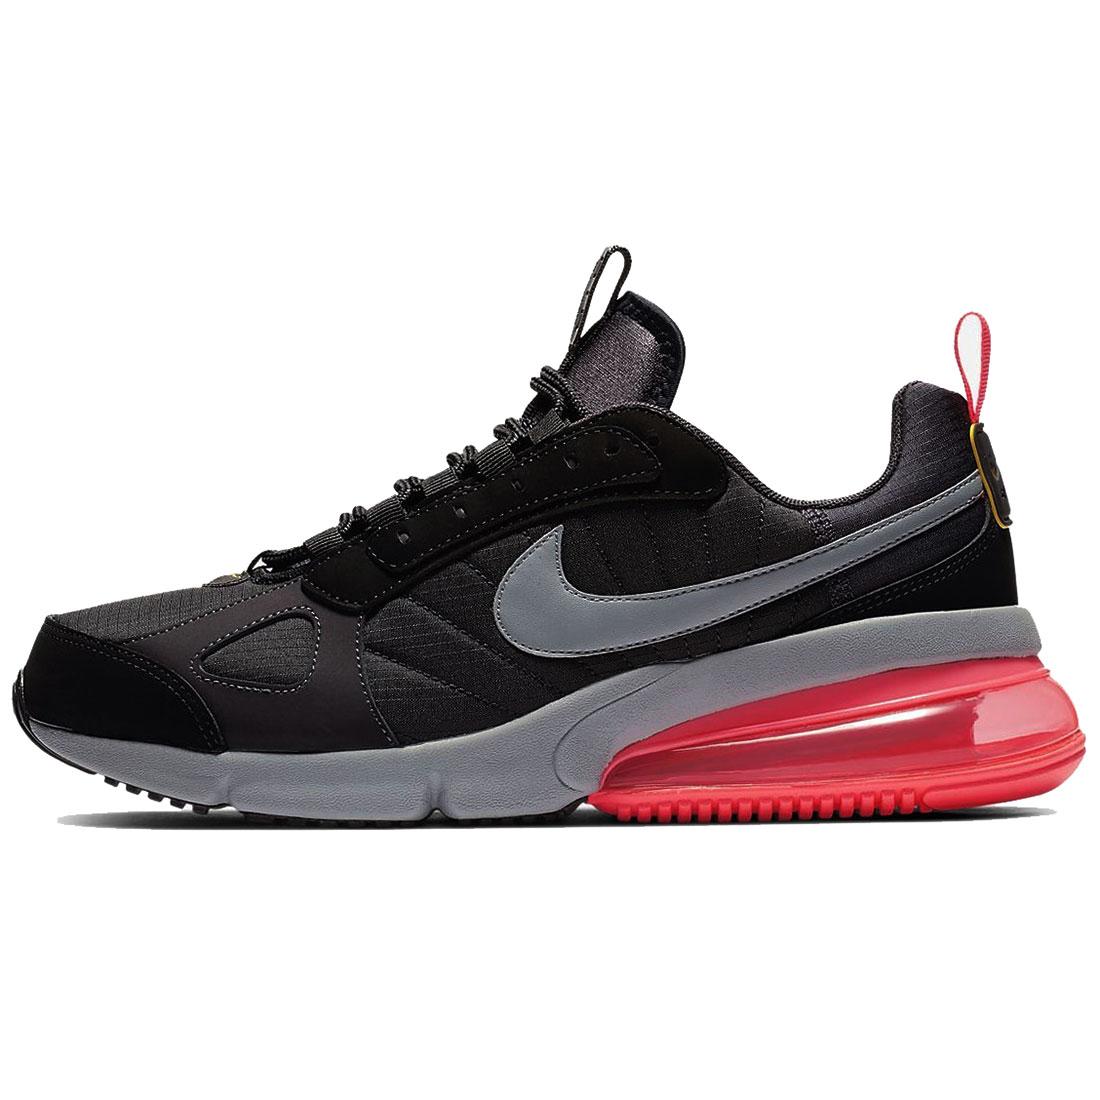 pretty nice 771a8 46dbd Nike Air Max 270 Futura Herren Sneaker schwarz grau AO1569 007 – Bild 2